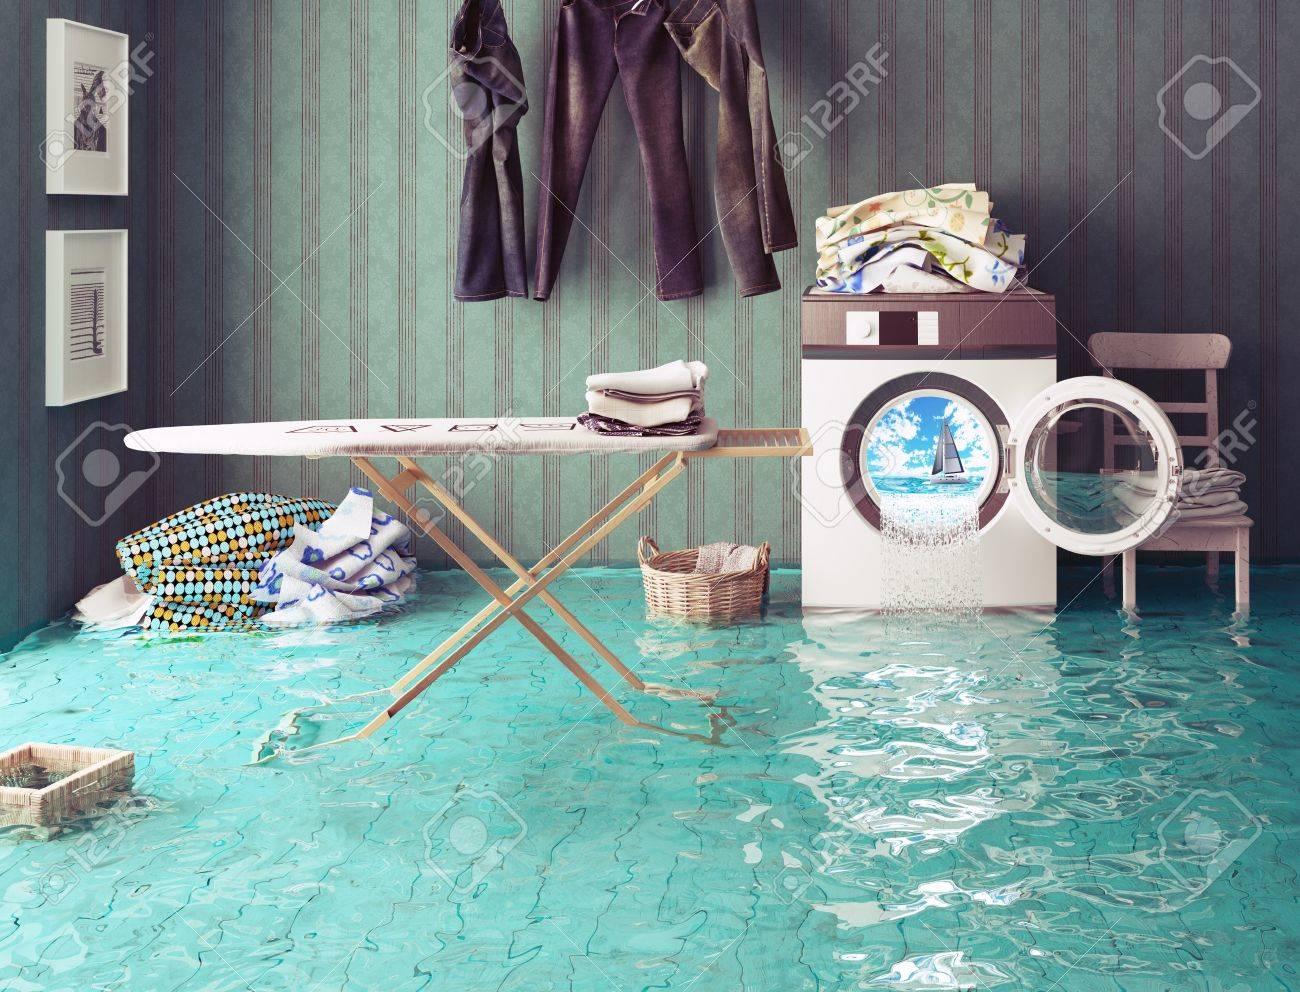 housework dreams. 3d Creative concept. Standard-Bild - 44926040